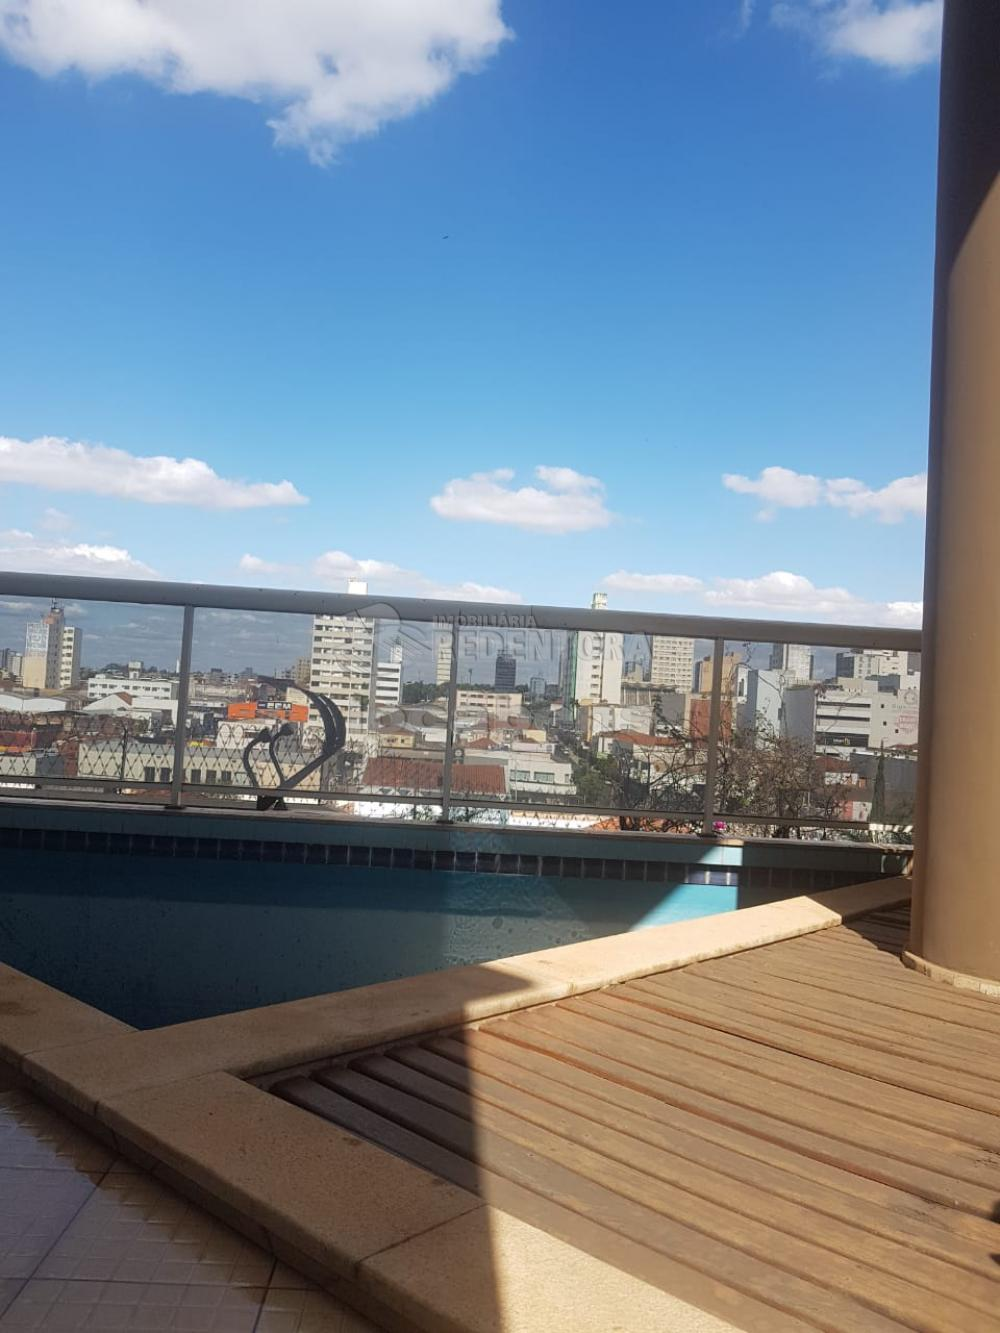 SAO JOSE DO RIO PRETO Apartamento Venda R$850.000,00 Condominio R$1.100,00 4 Dormitorios 2 Suites Area construida 330.00m2